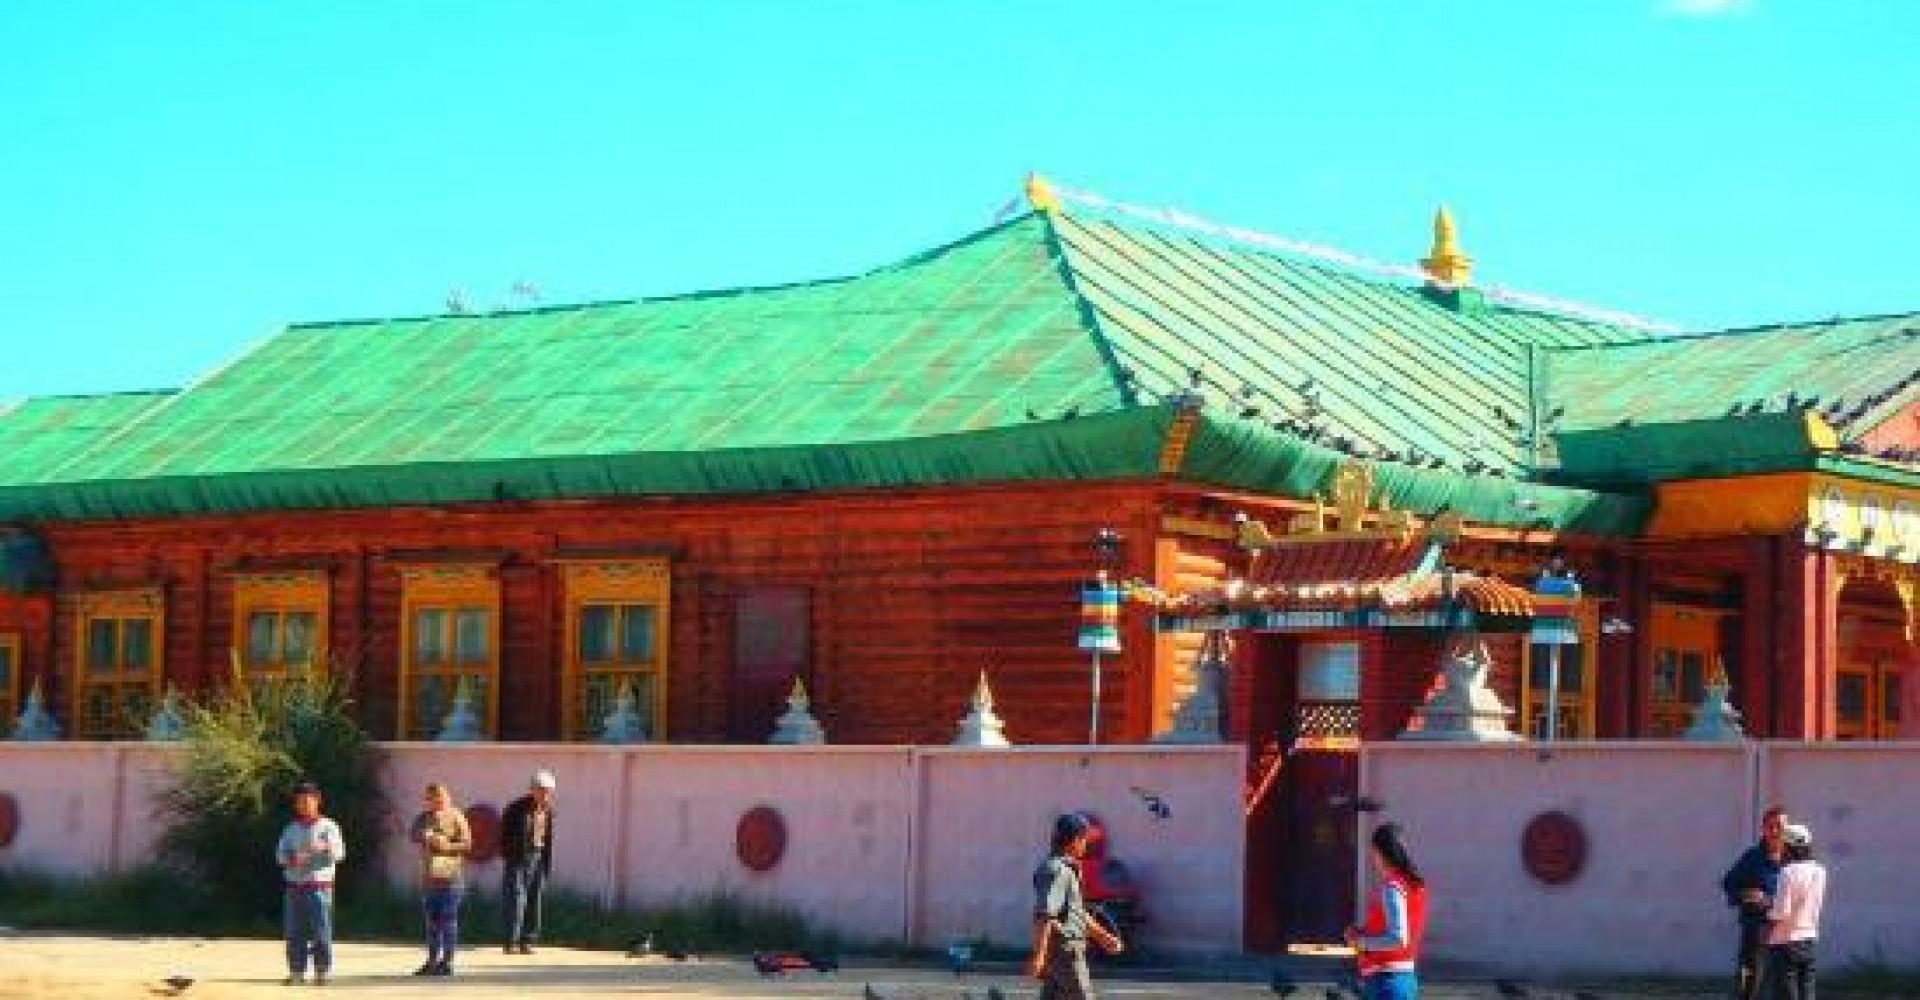 Kharagiin Monastery